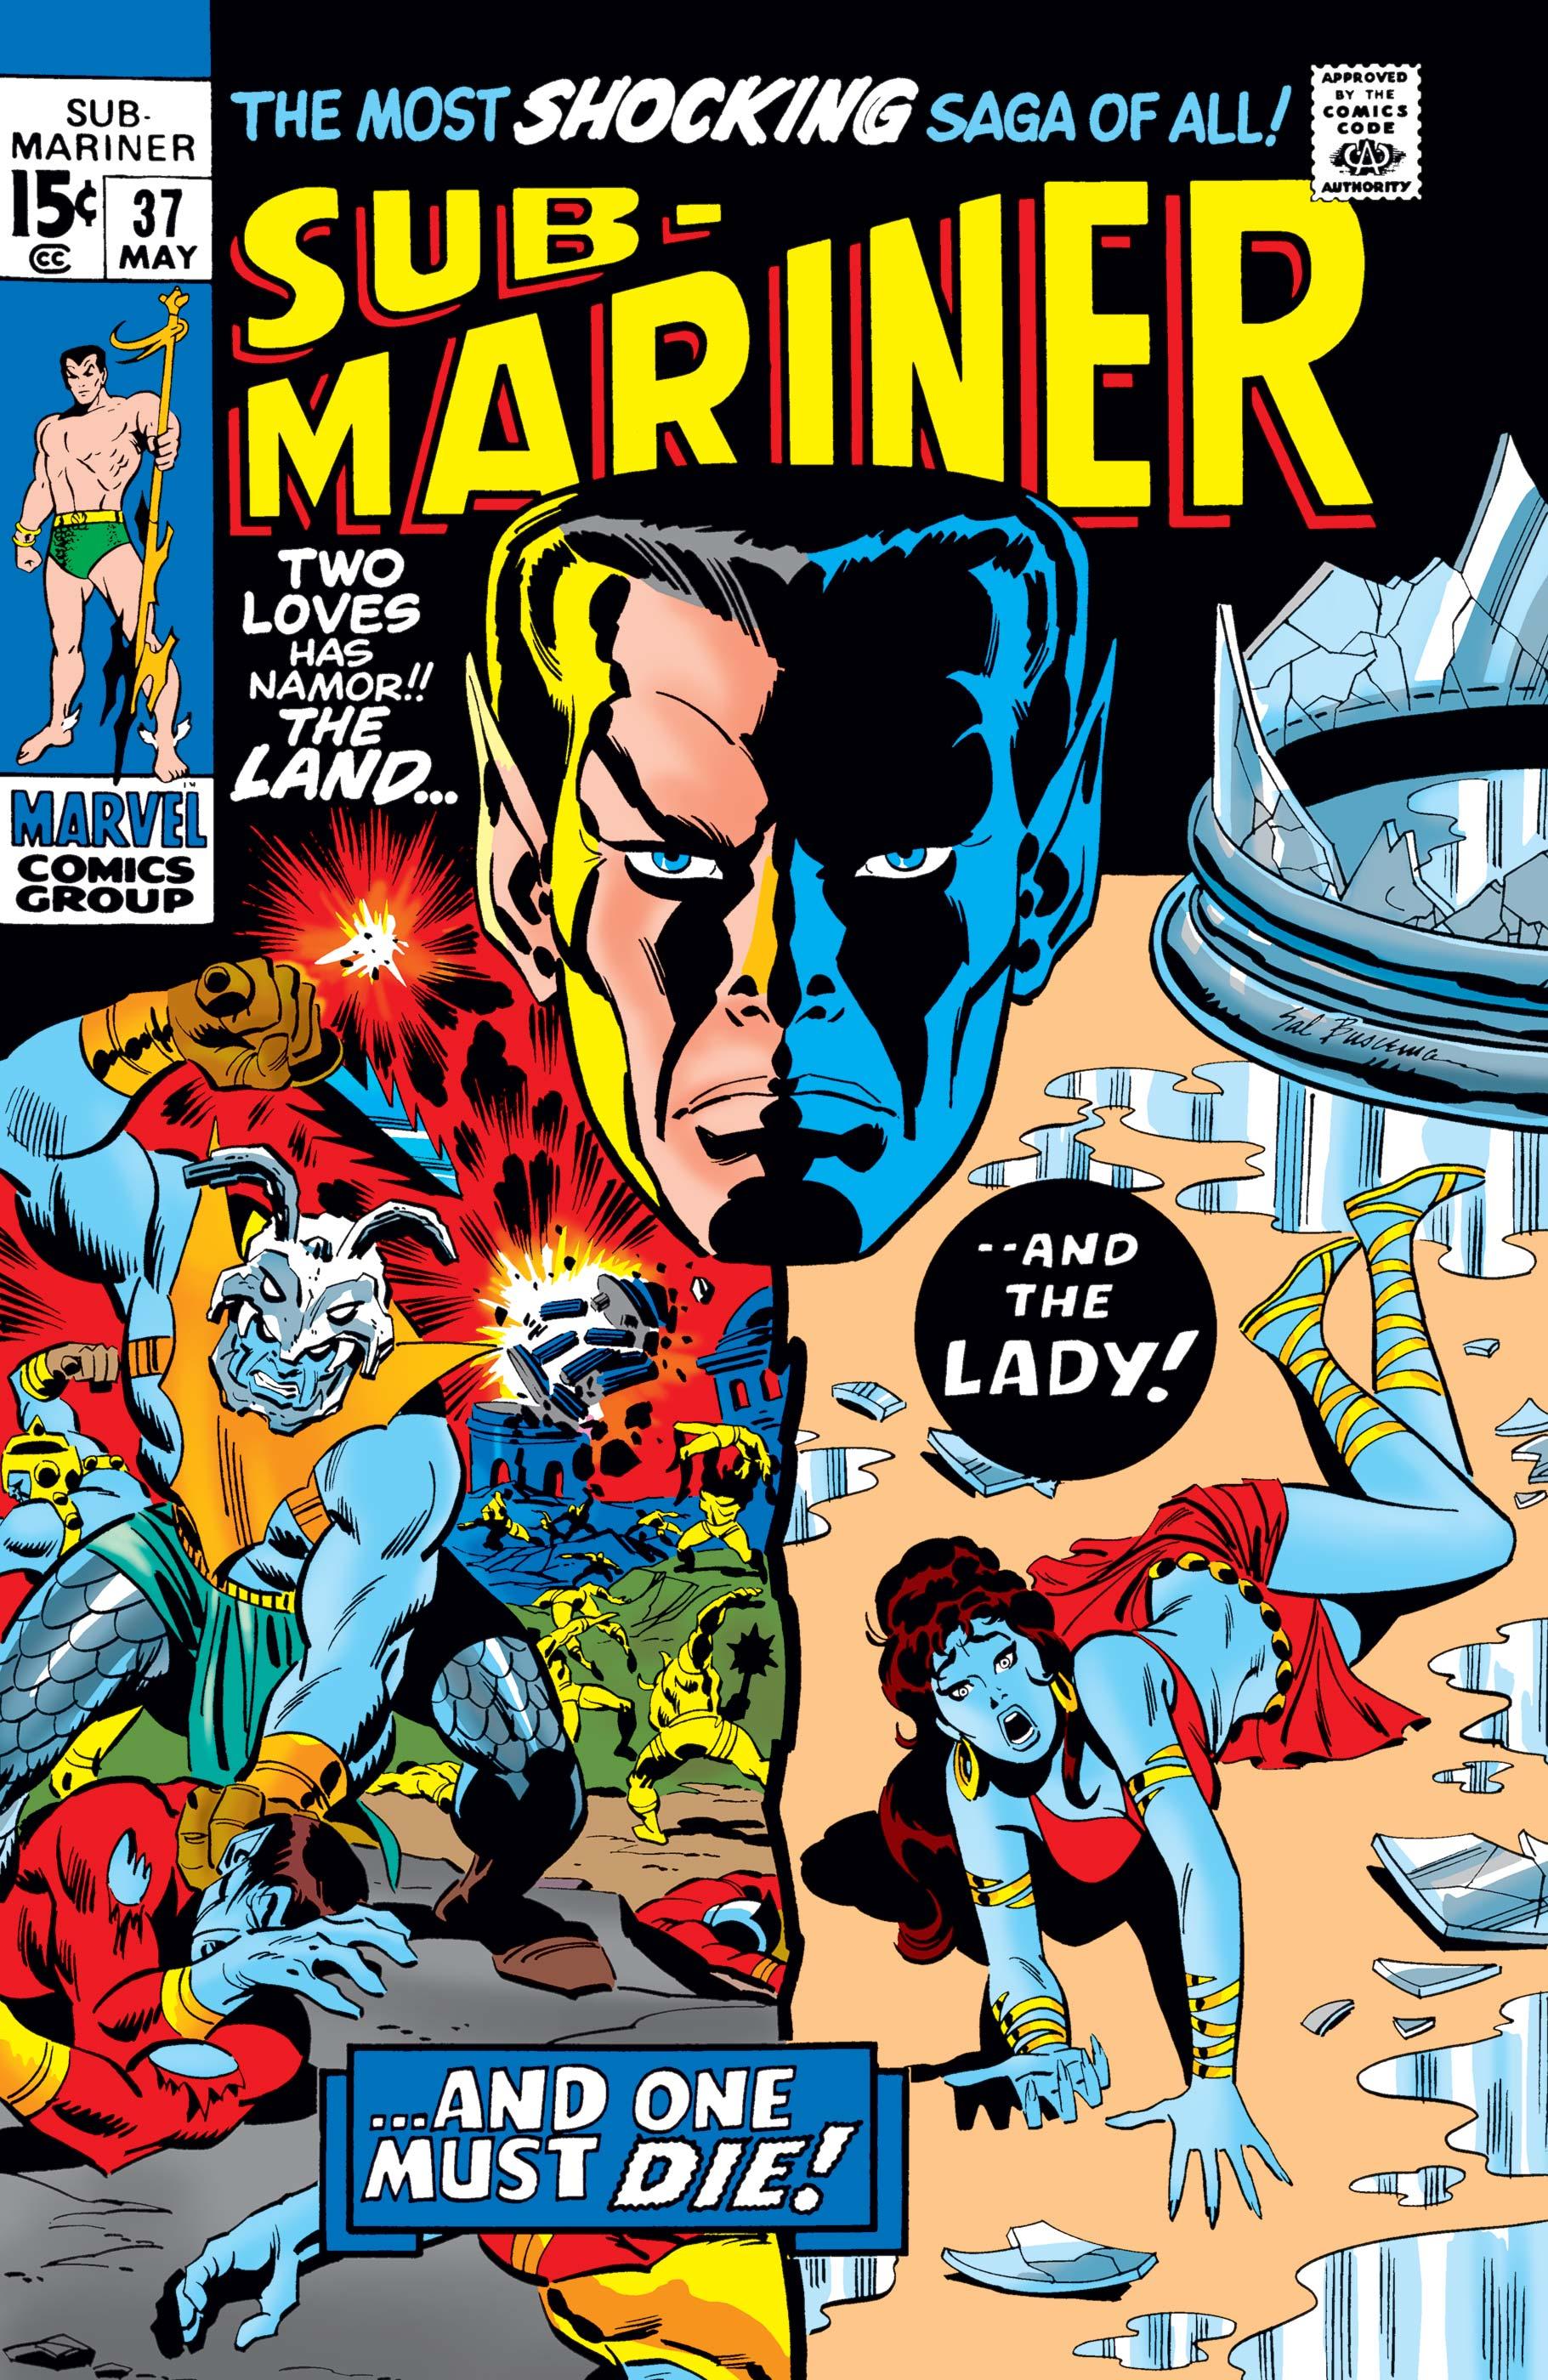 Sub-Mariner (1968) #37